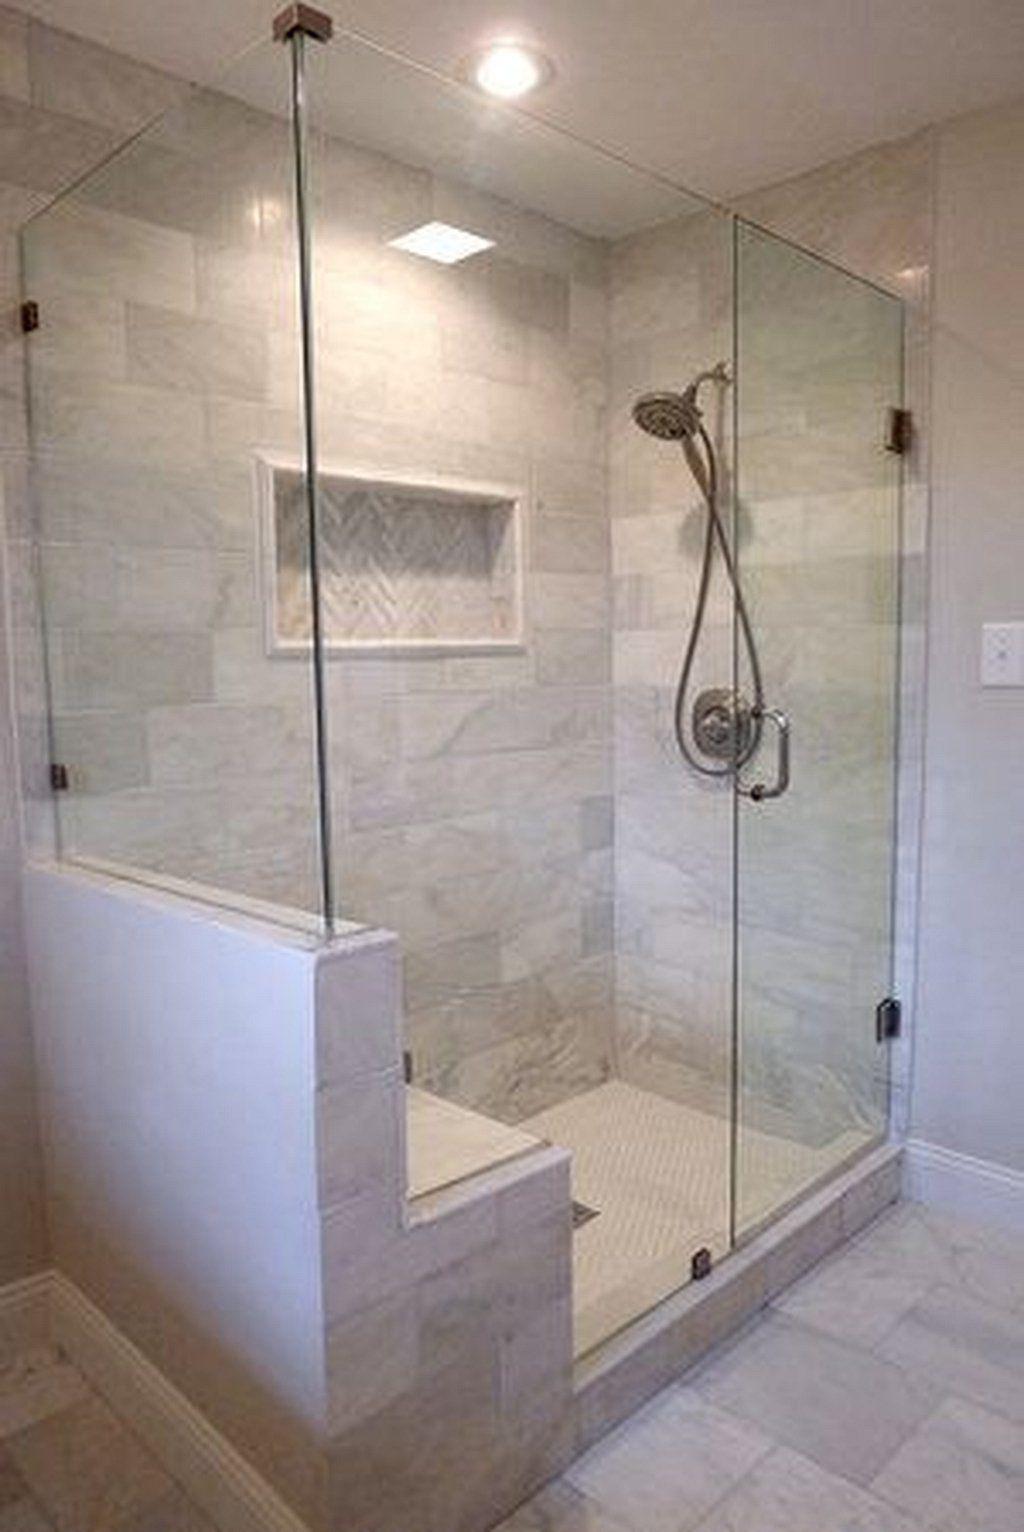 Best 50 Shower Ideas Bathroom Showerremodel In 2020 With Images Affordable Bathroom Remodel Bathroom Remodel Master Bathroom Remodel Designs